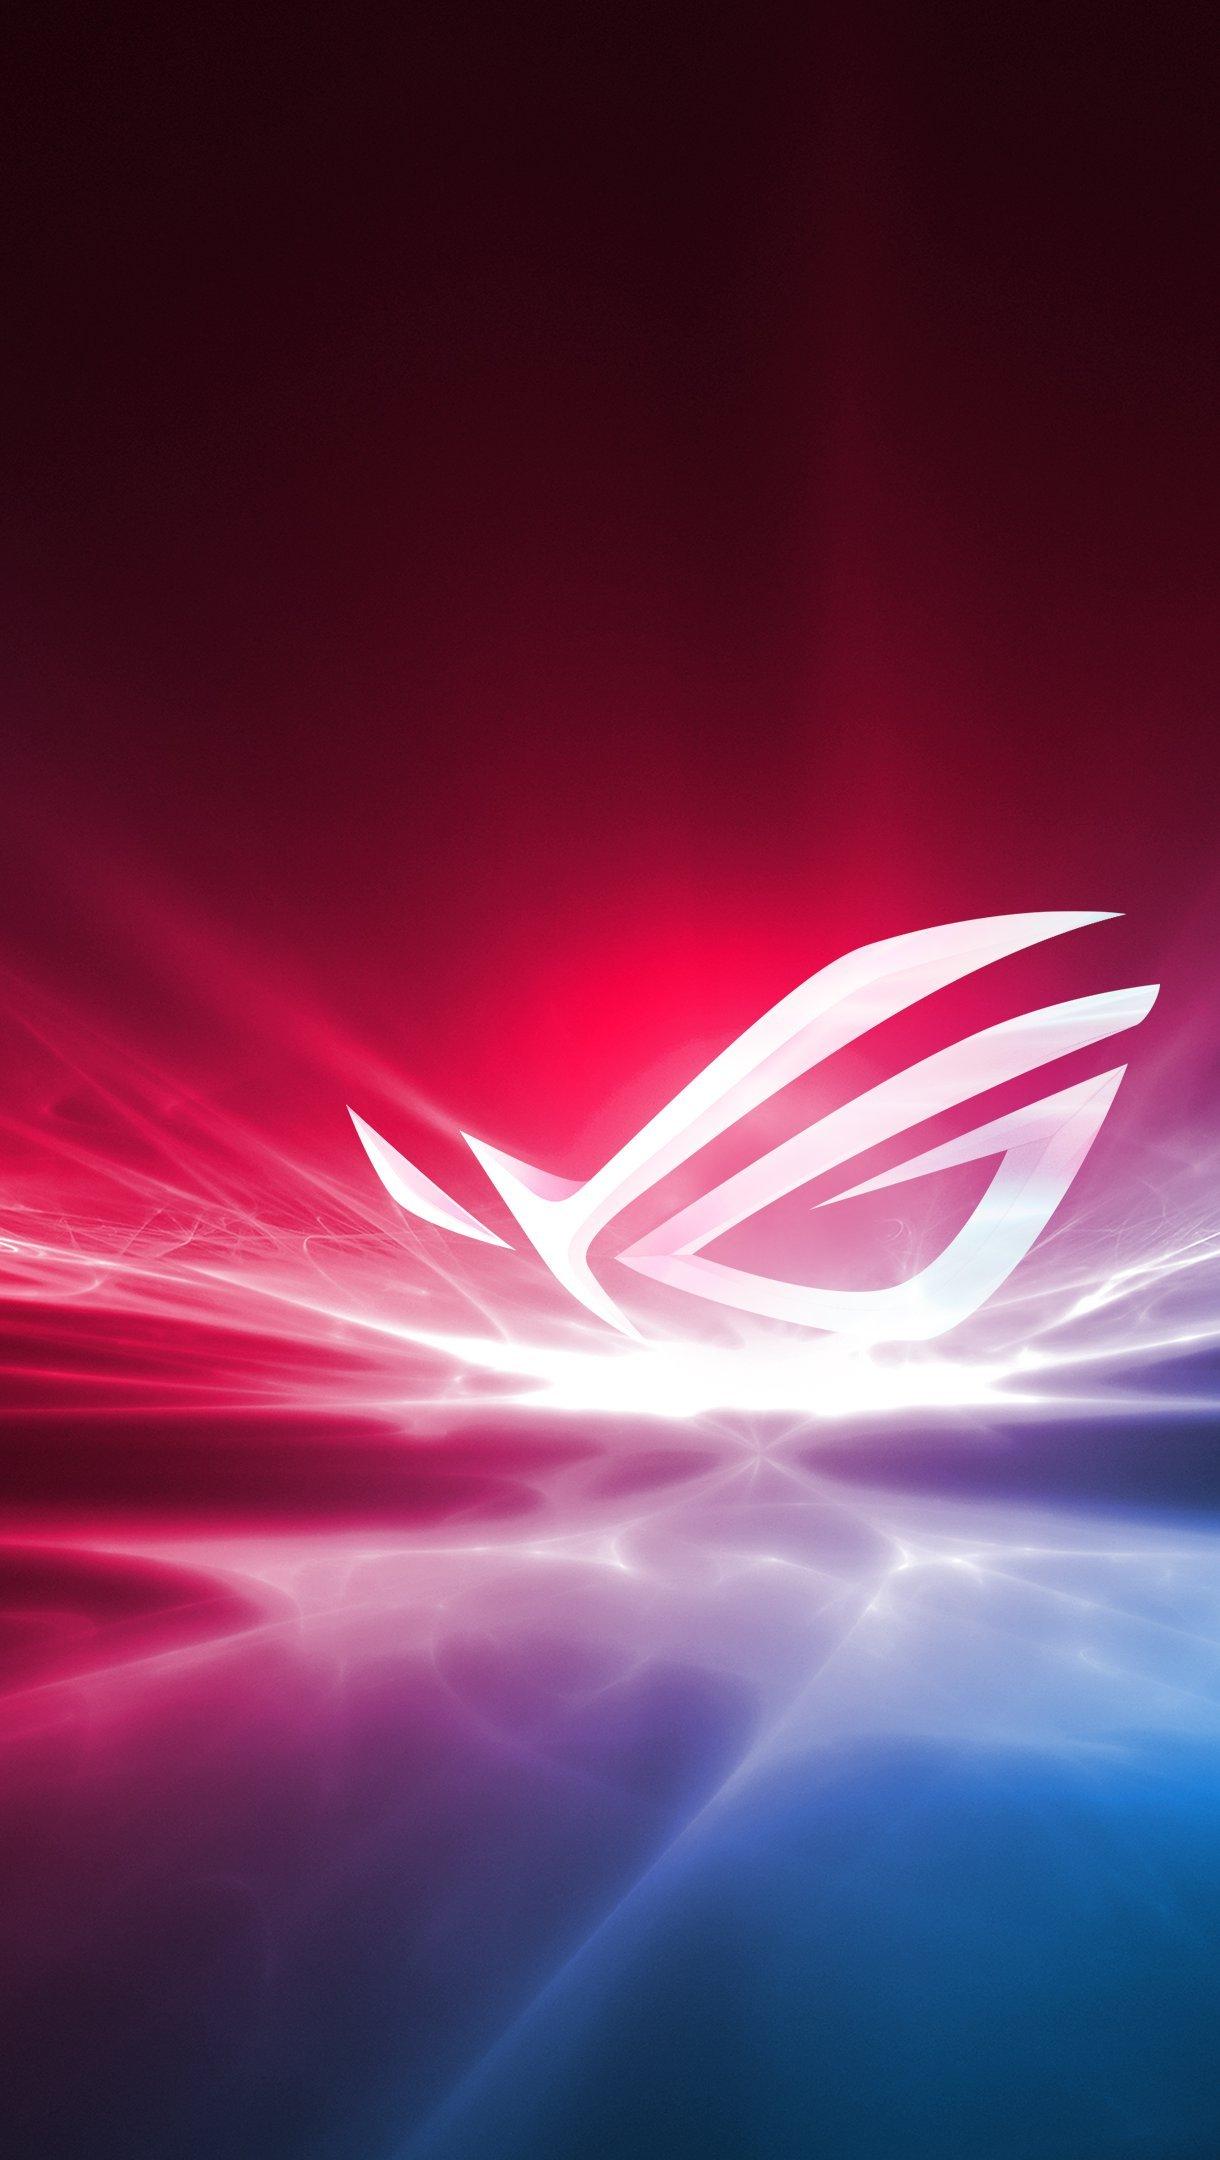 Fondos de pantalla Asus ROG Republic of Gamers Logo Vertical